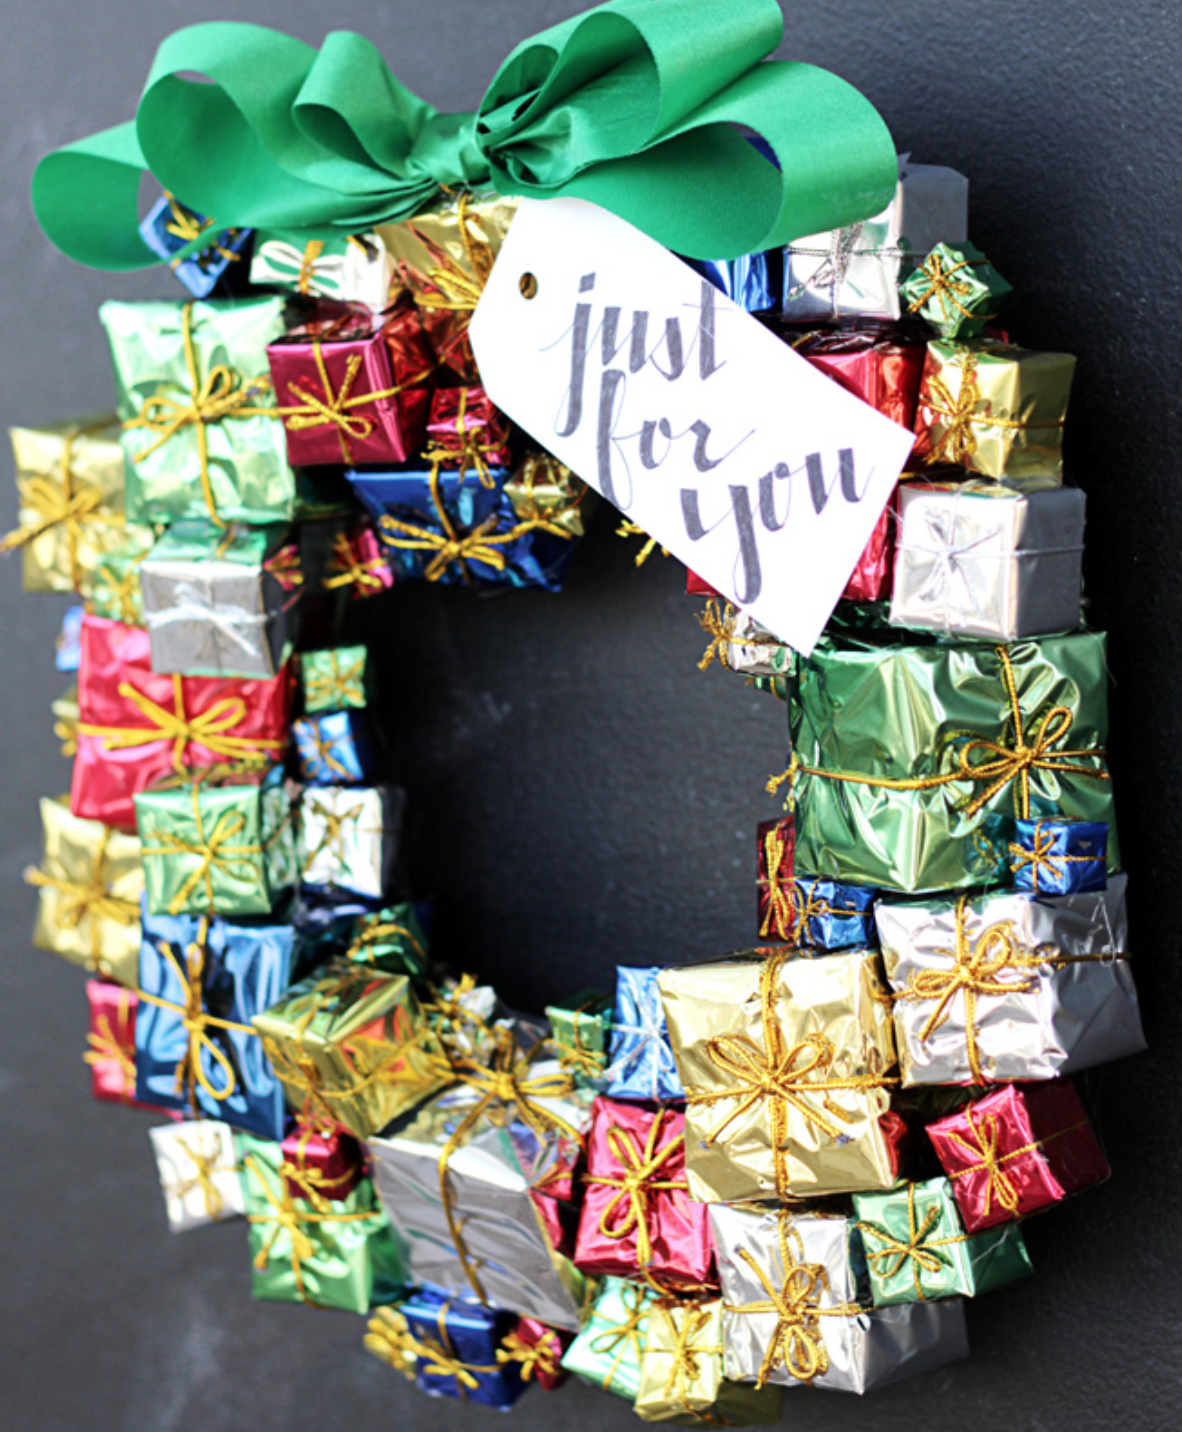 Dollar Tree Christmas Decor And Gift Ideas: 100 Cheap & Easy DIY Christmas Decorations